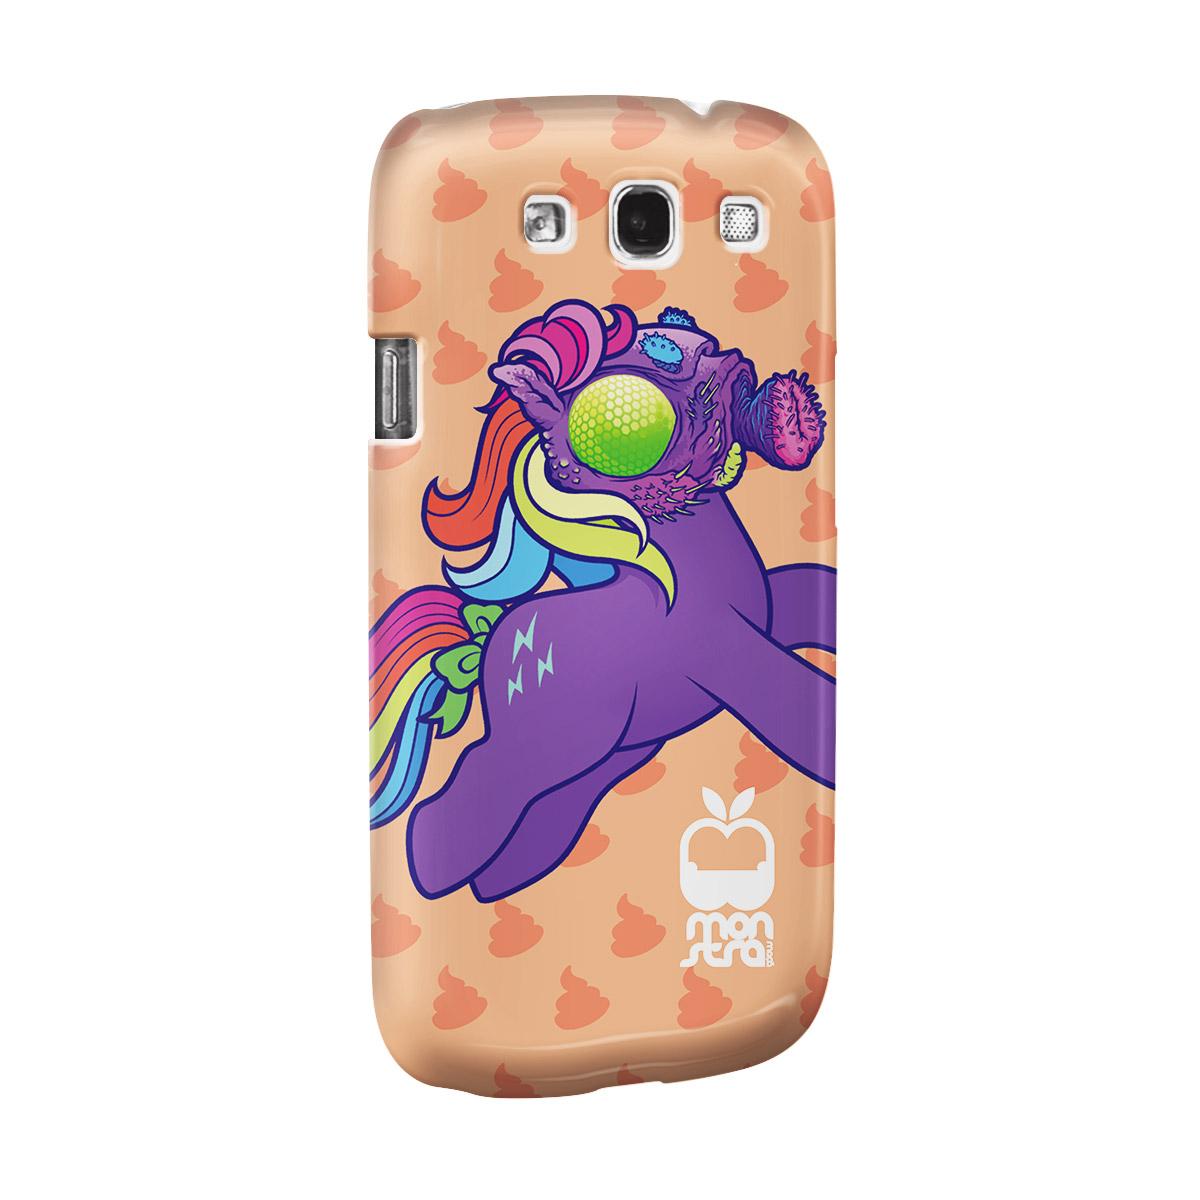 Capa para Samsung Galaxy S3 Monstra Maçã My Little Monster